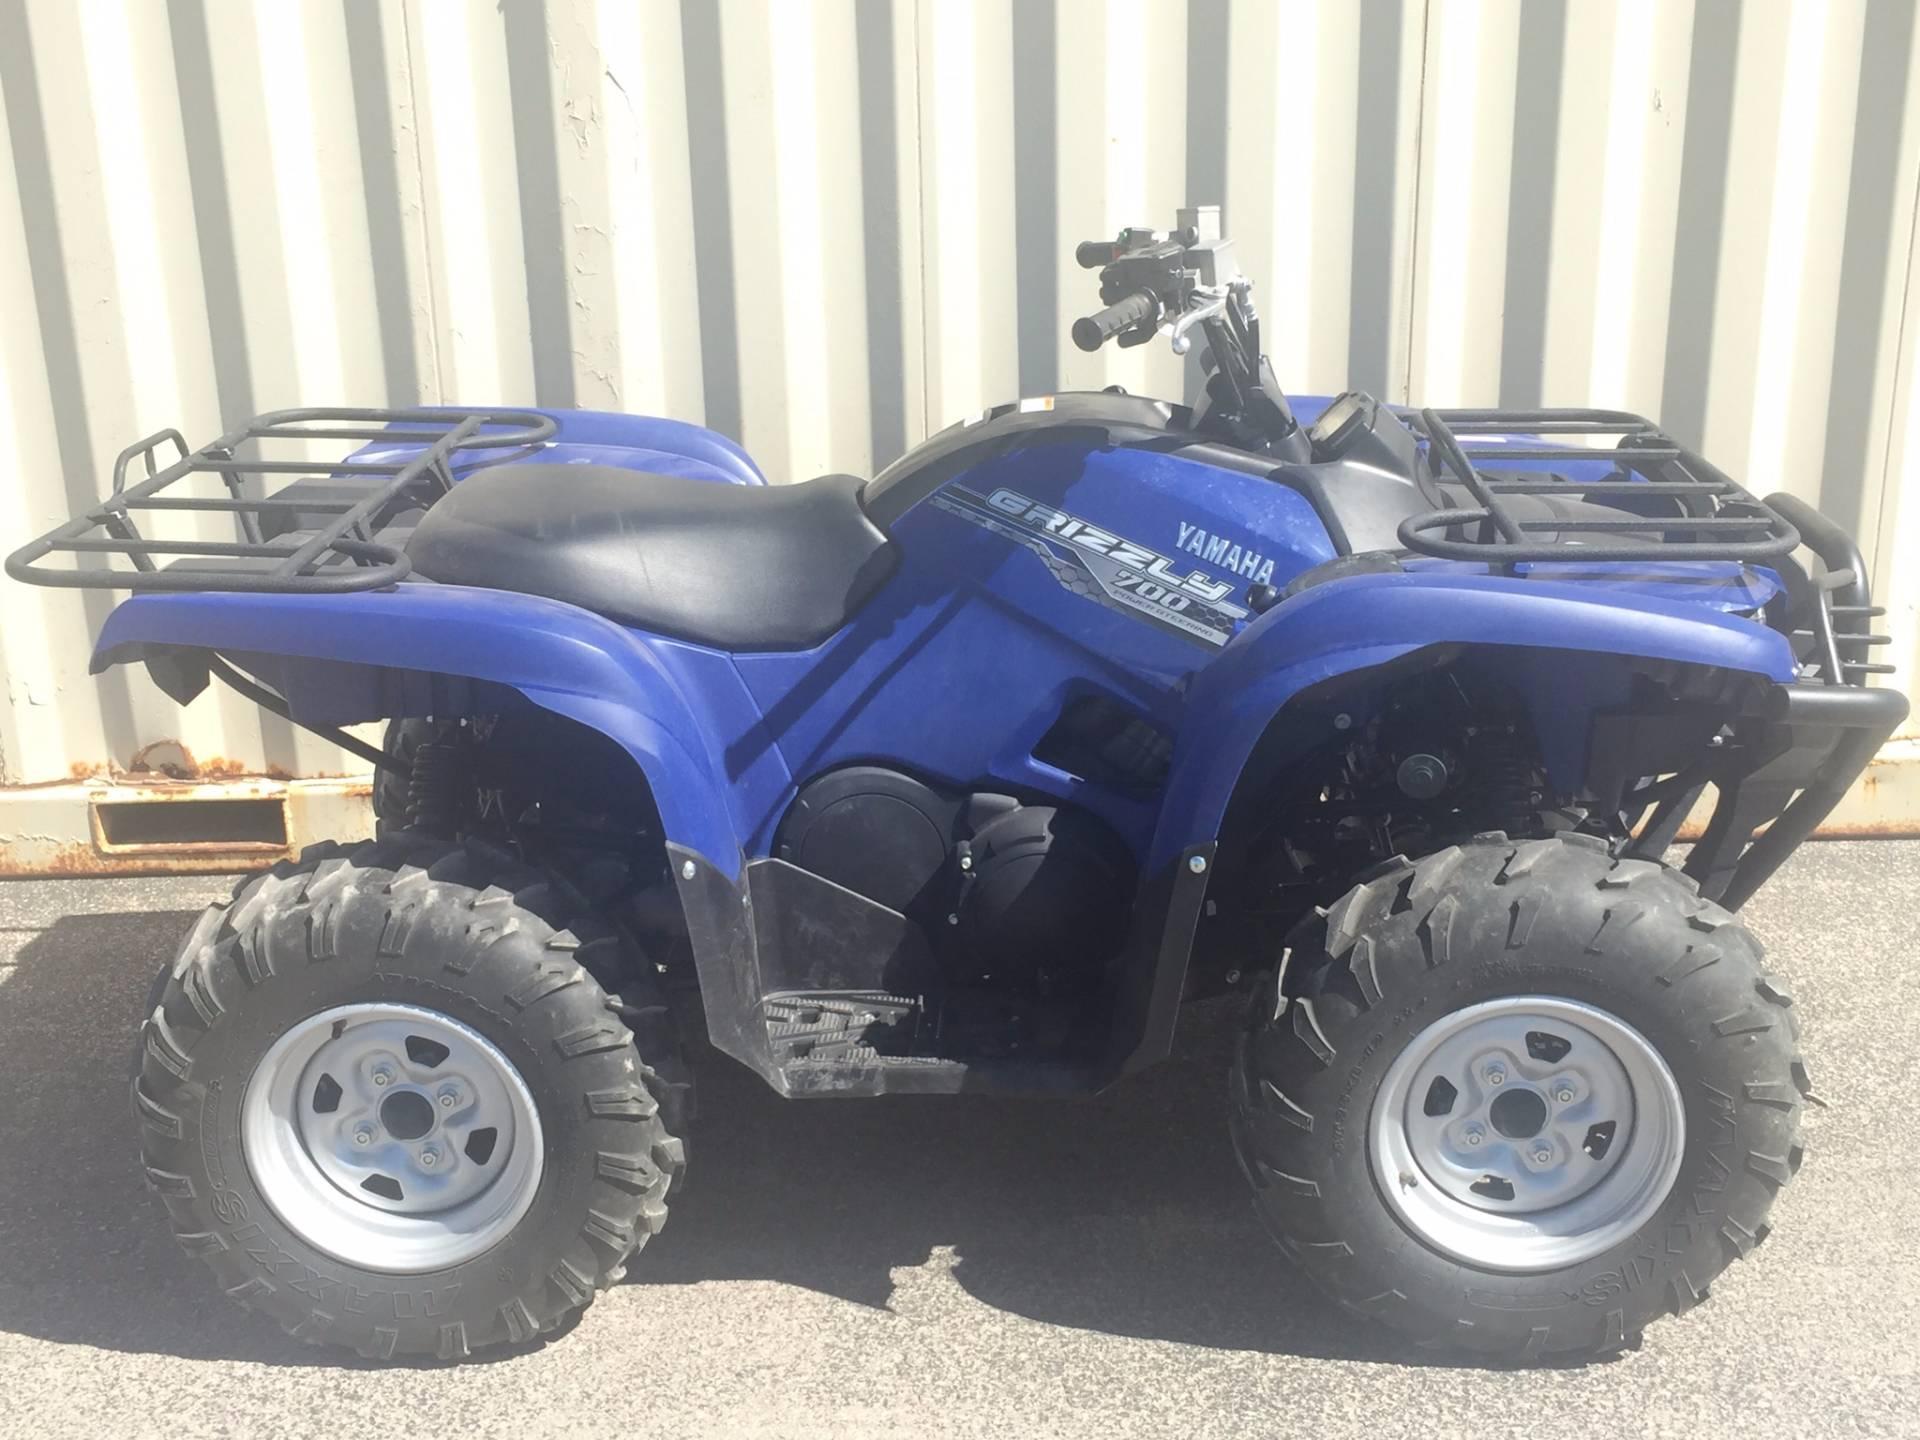 2015 yamaha grizzly 700 for sale for Yamaha rapid city sd